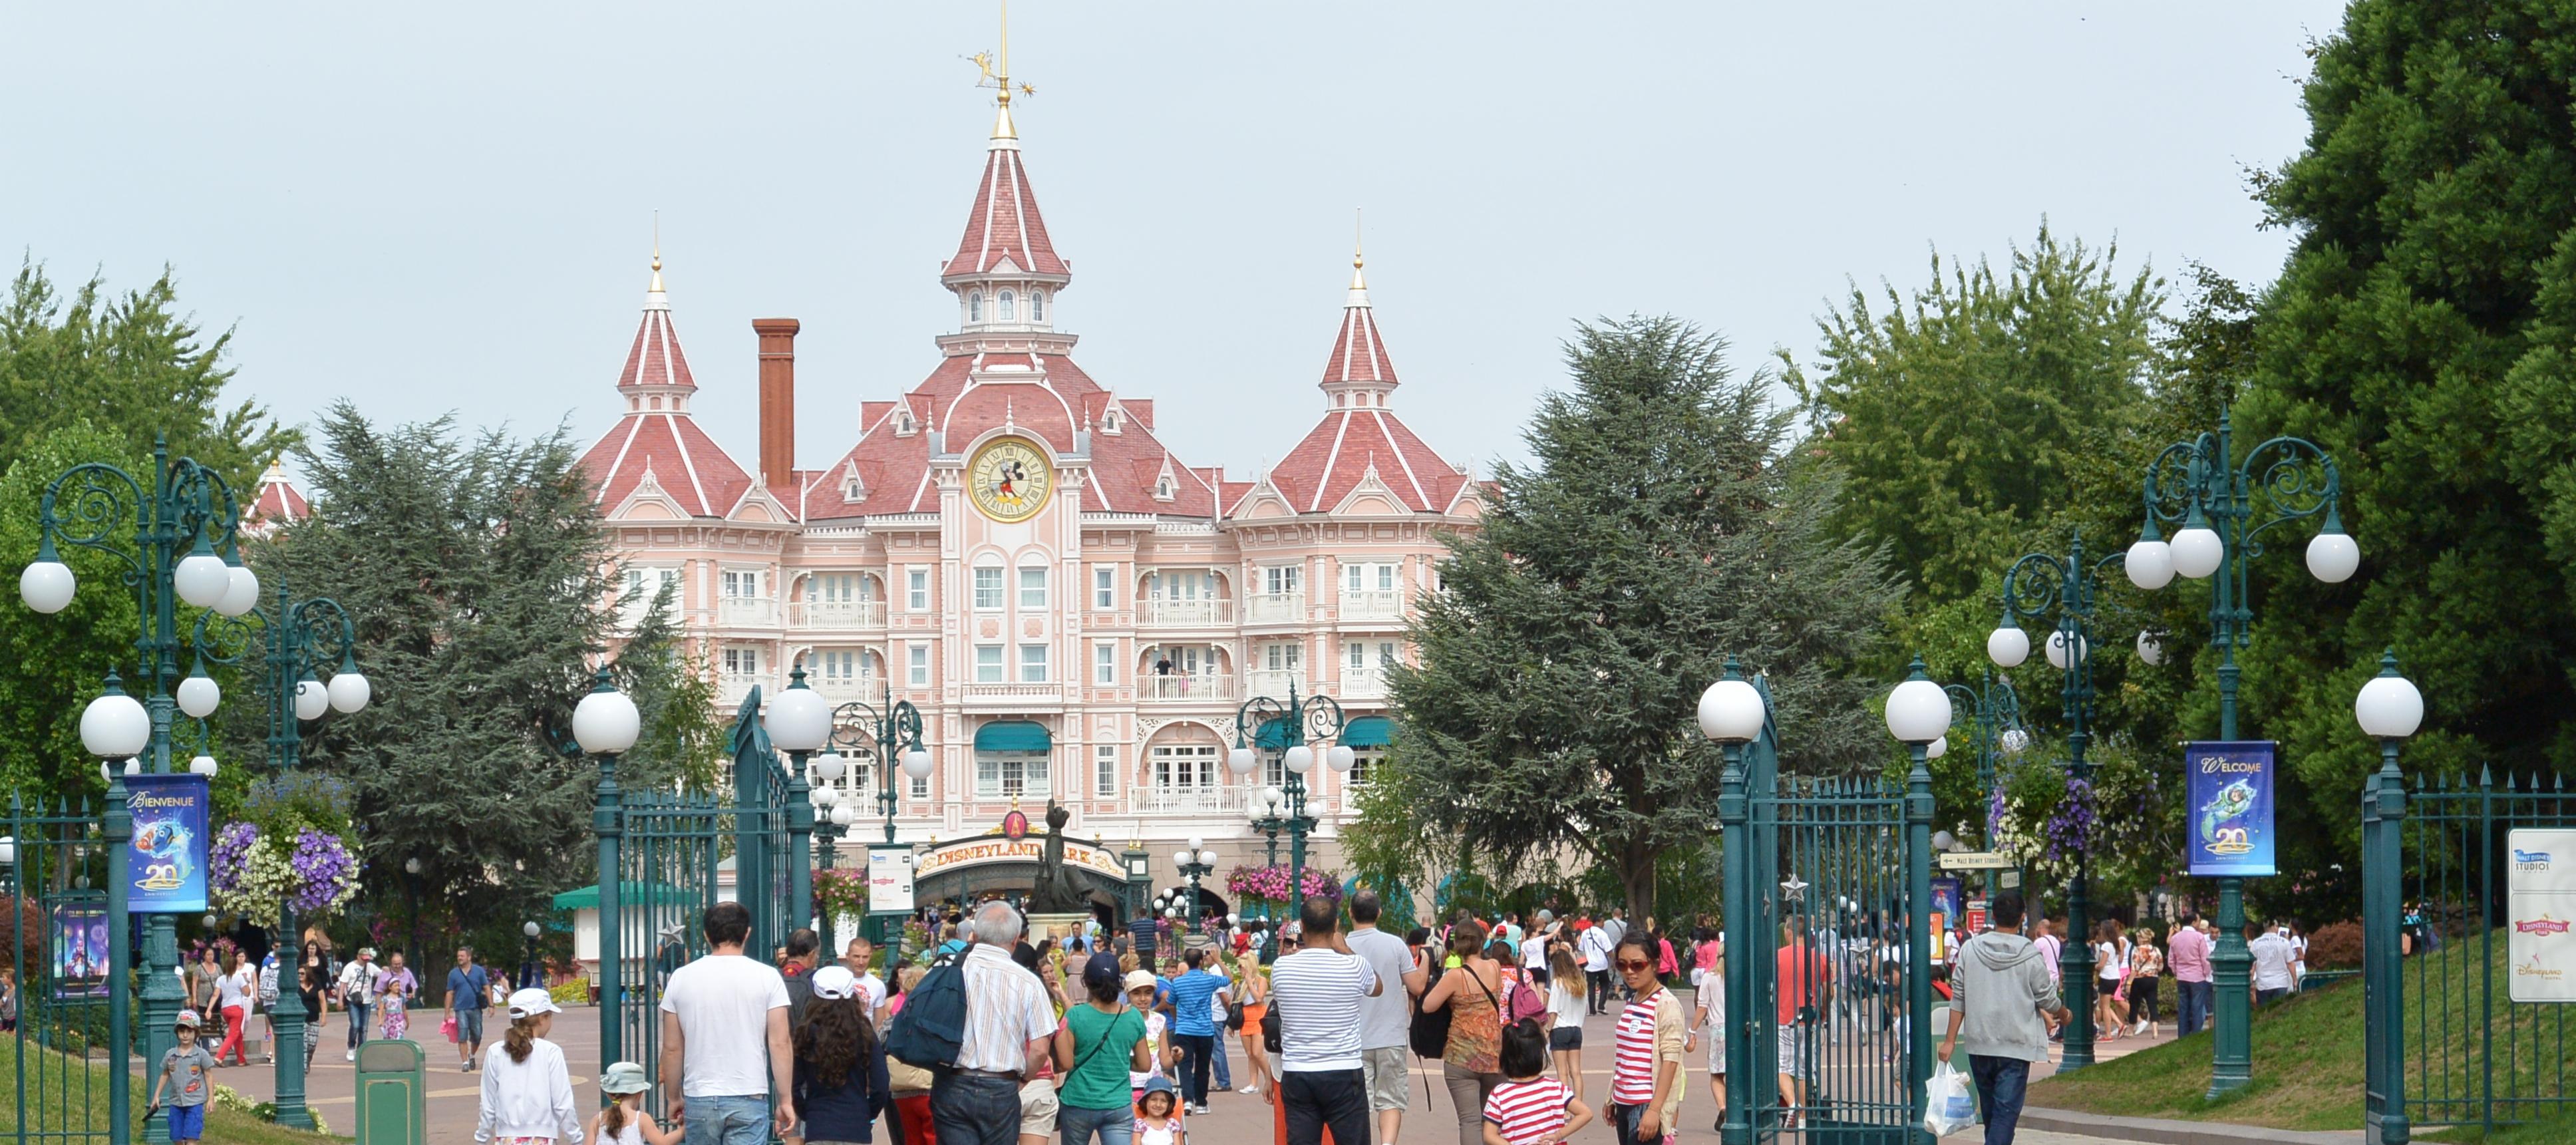 Disneyland Paris Park Entrance at the Disneyland Hotel